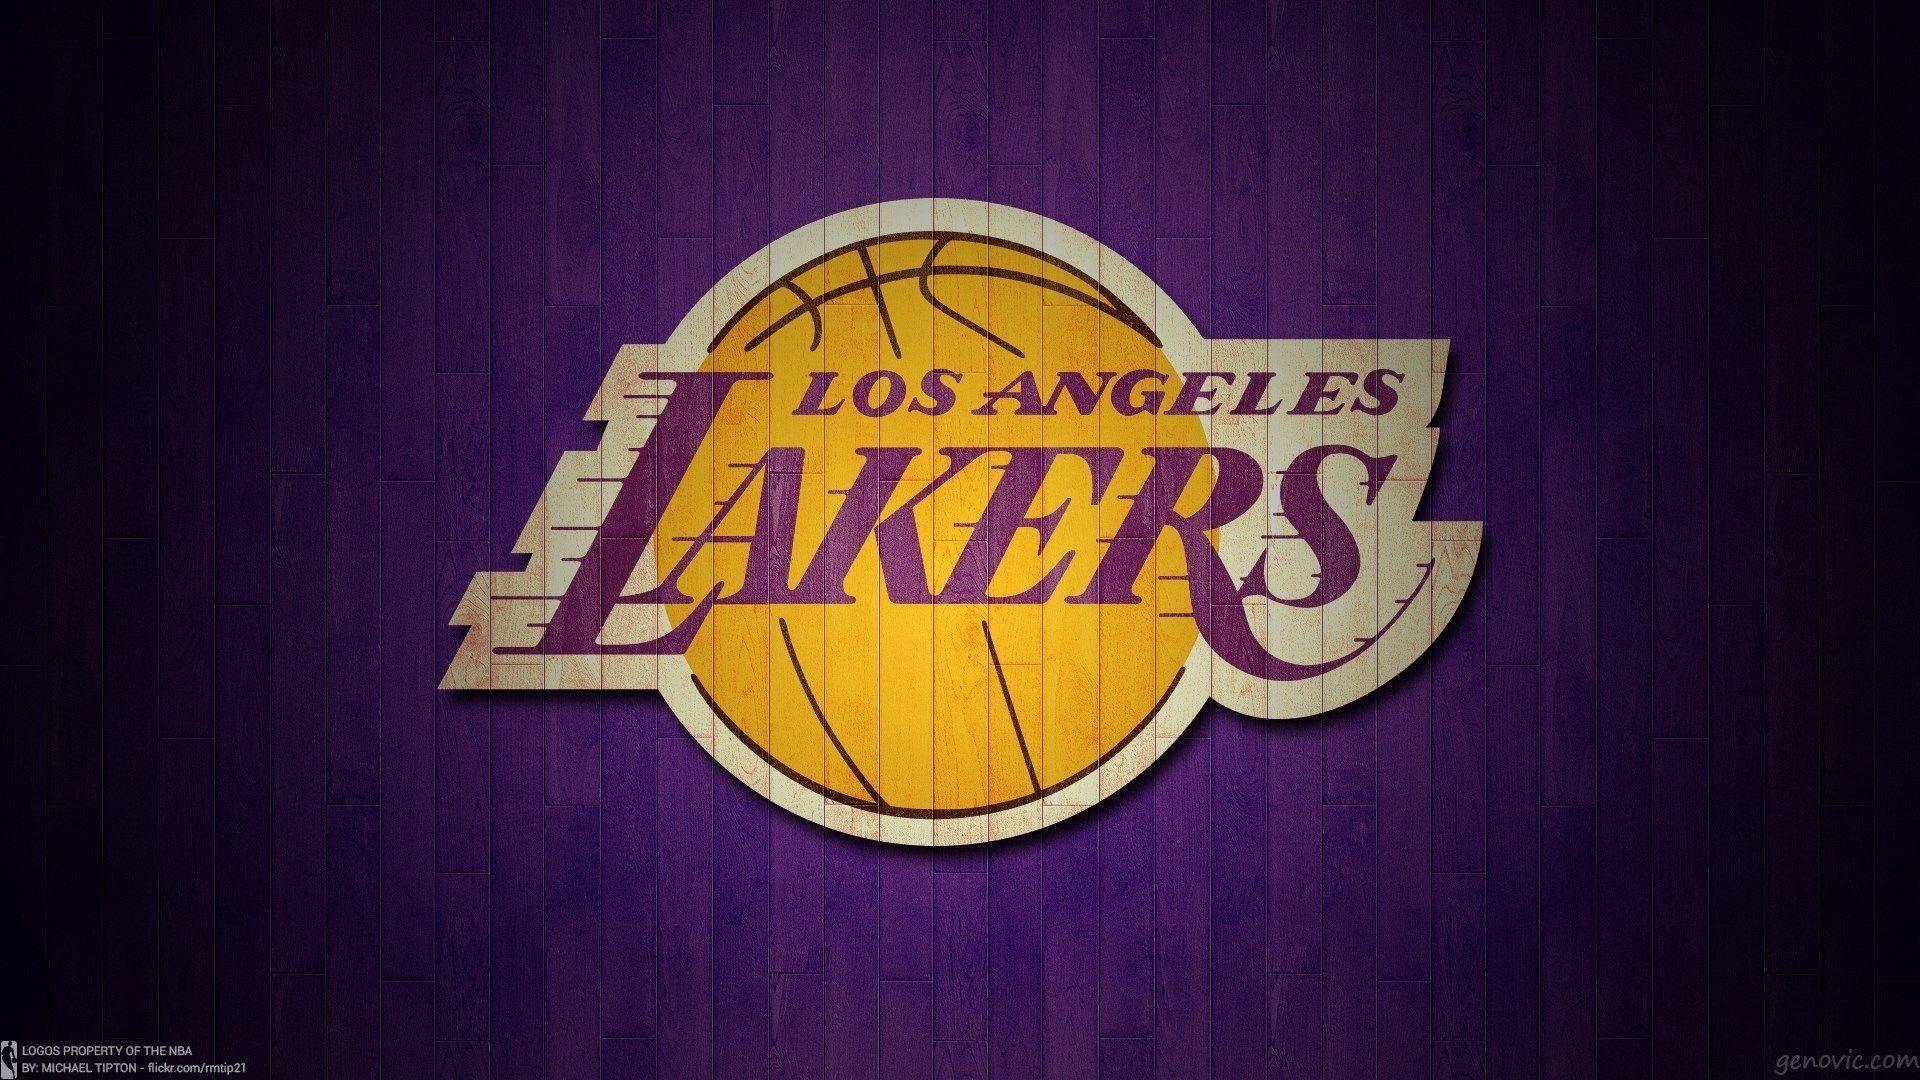 LA Lakers Wallpapers   Top LA Lakers Backgrounds 1920x1080